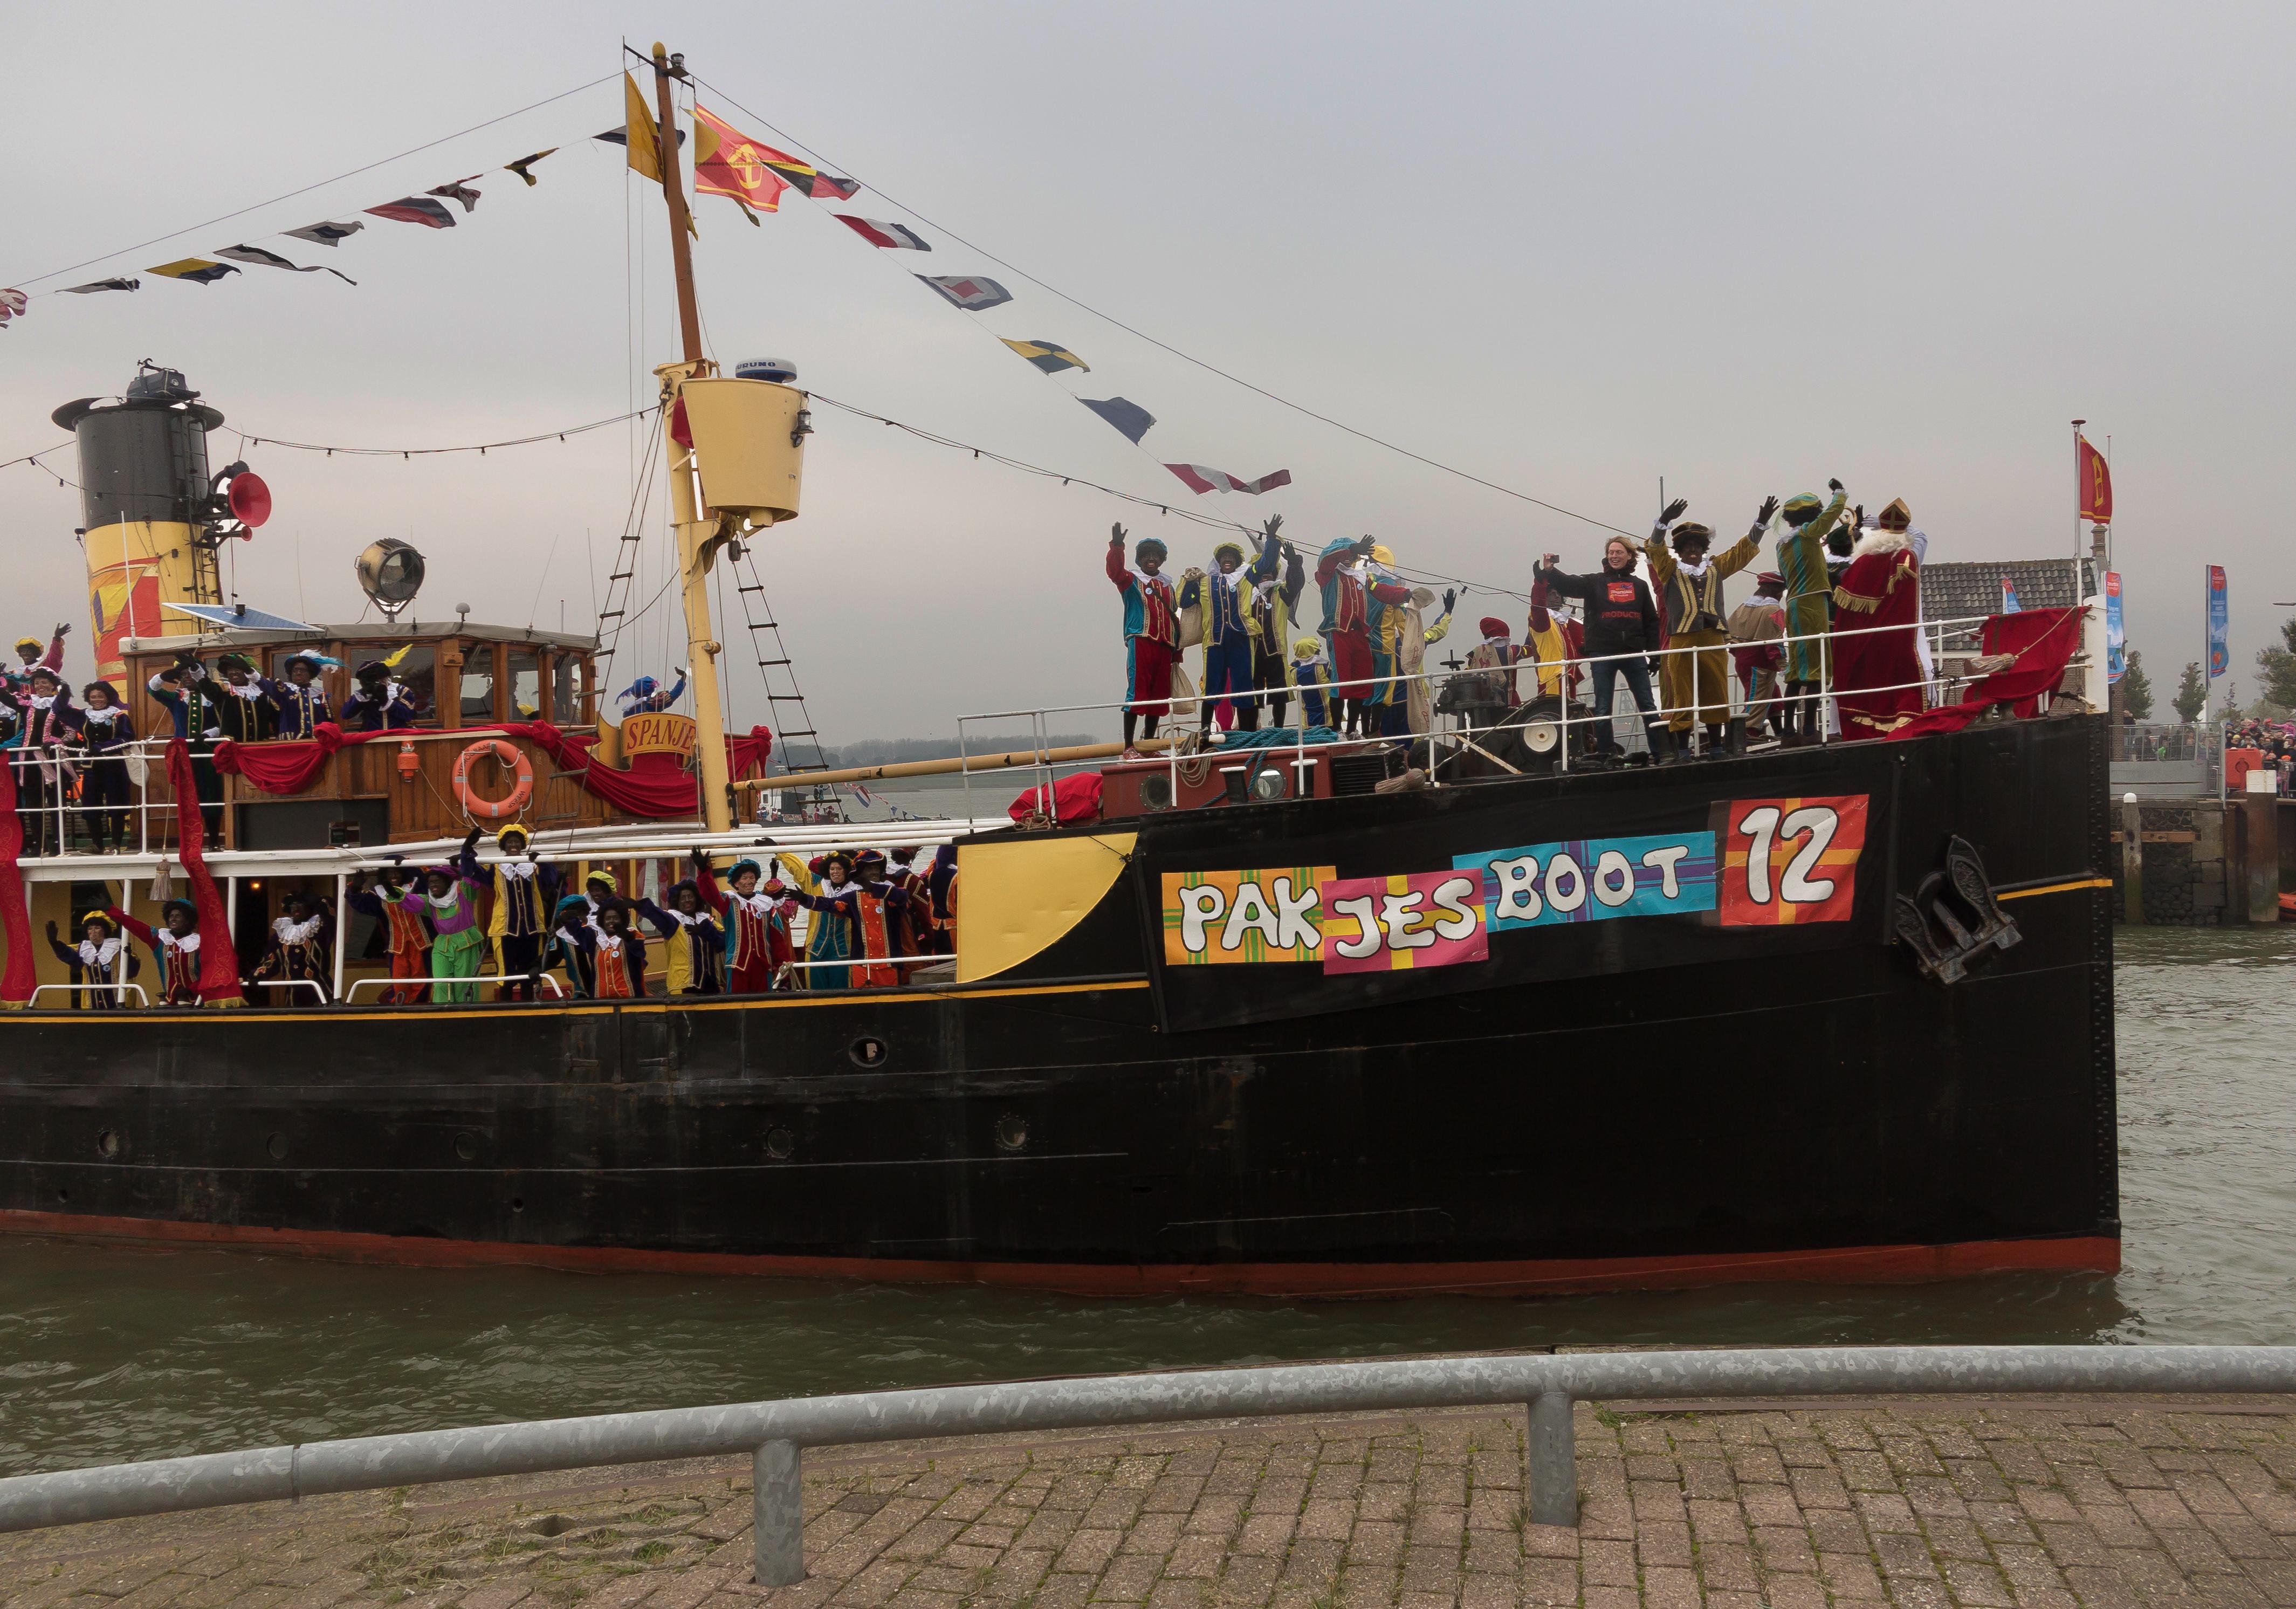 Bestand Nationale Intocht Sinterklaas In Maassluis De Pakjesboot Img 4628 2016 11 12 11 48 Jpg Wikipedia